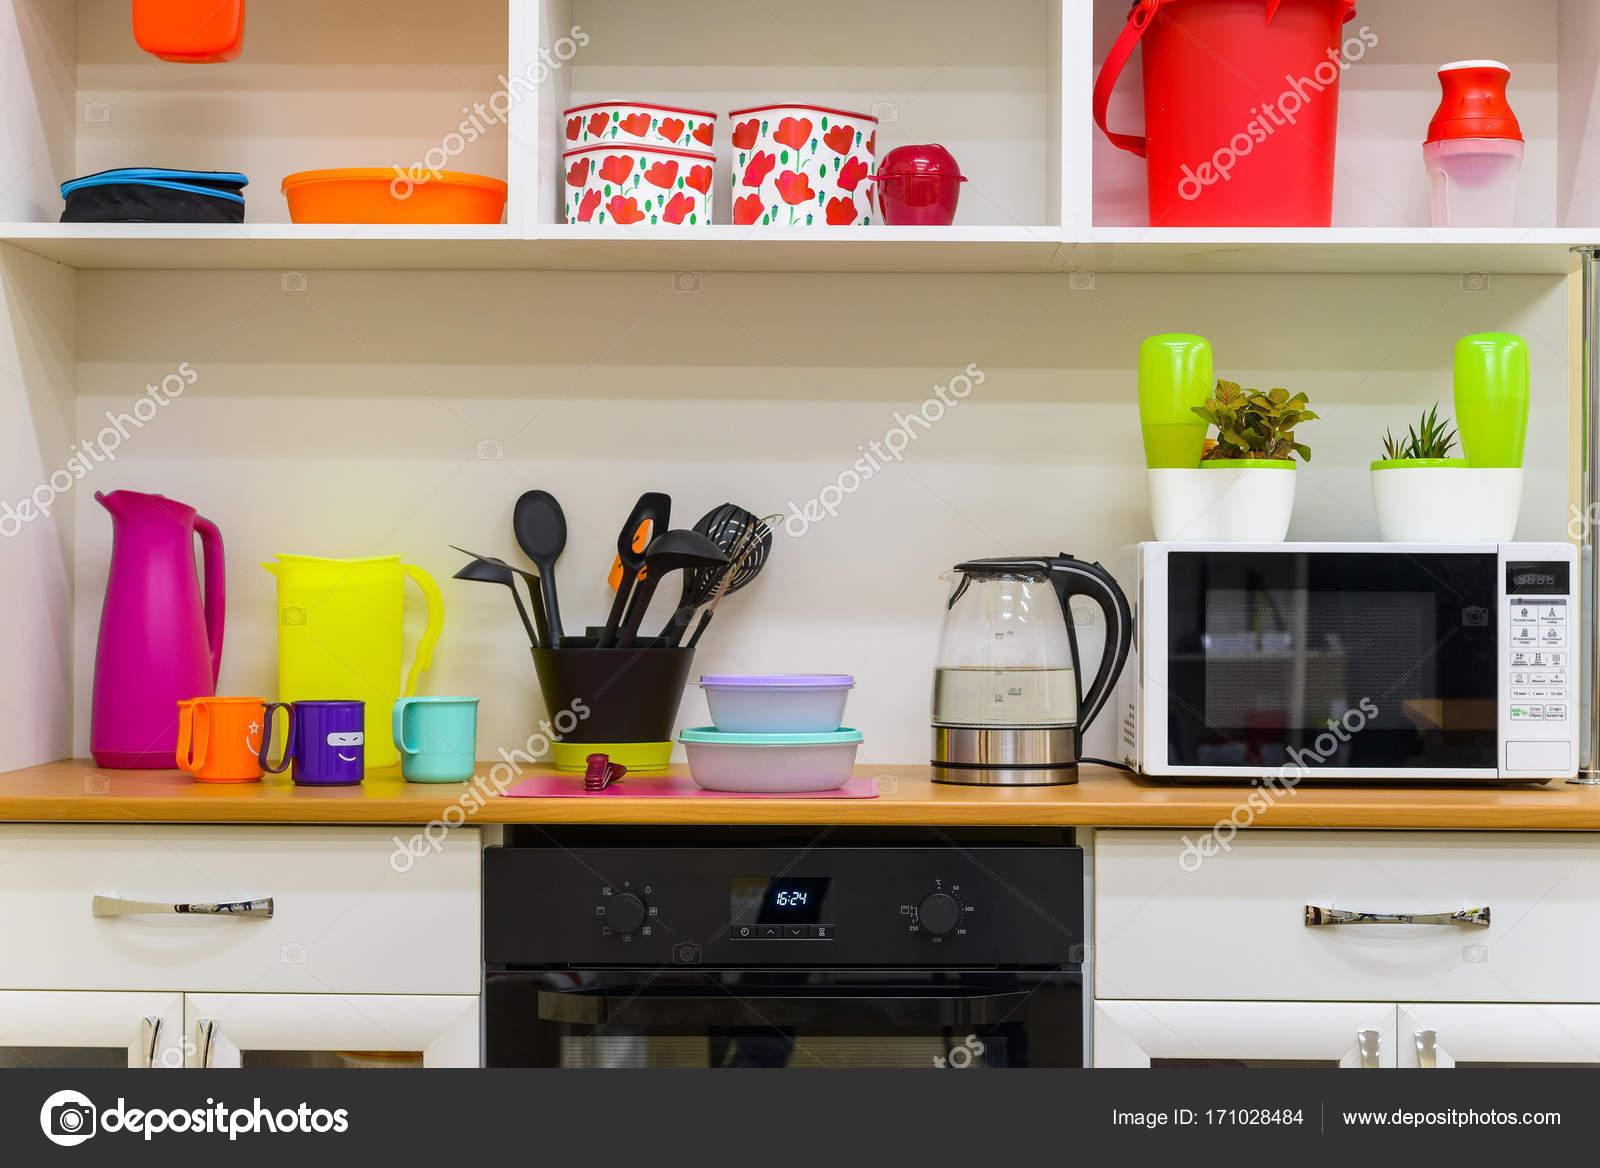 Moderne bunte Küche Interieur — Stockfoto © Greentellect #171028484